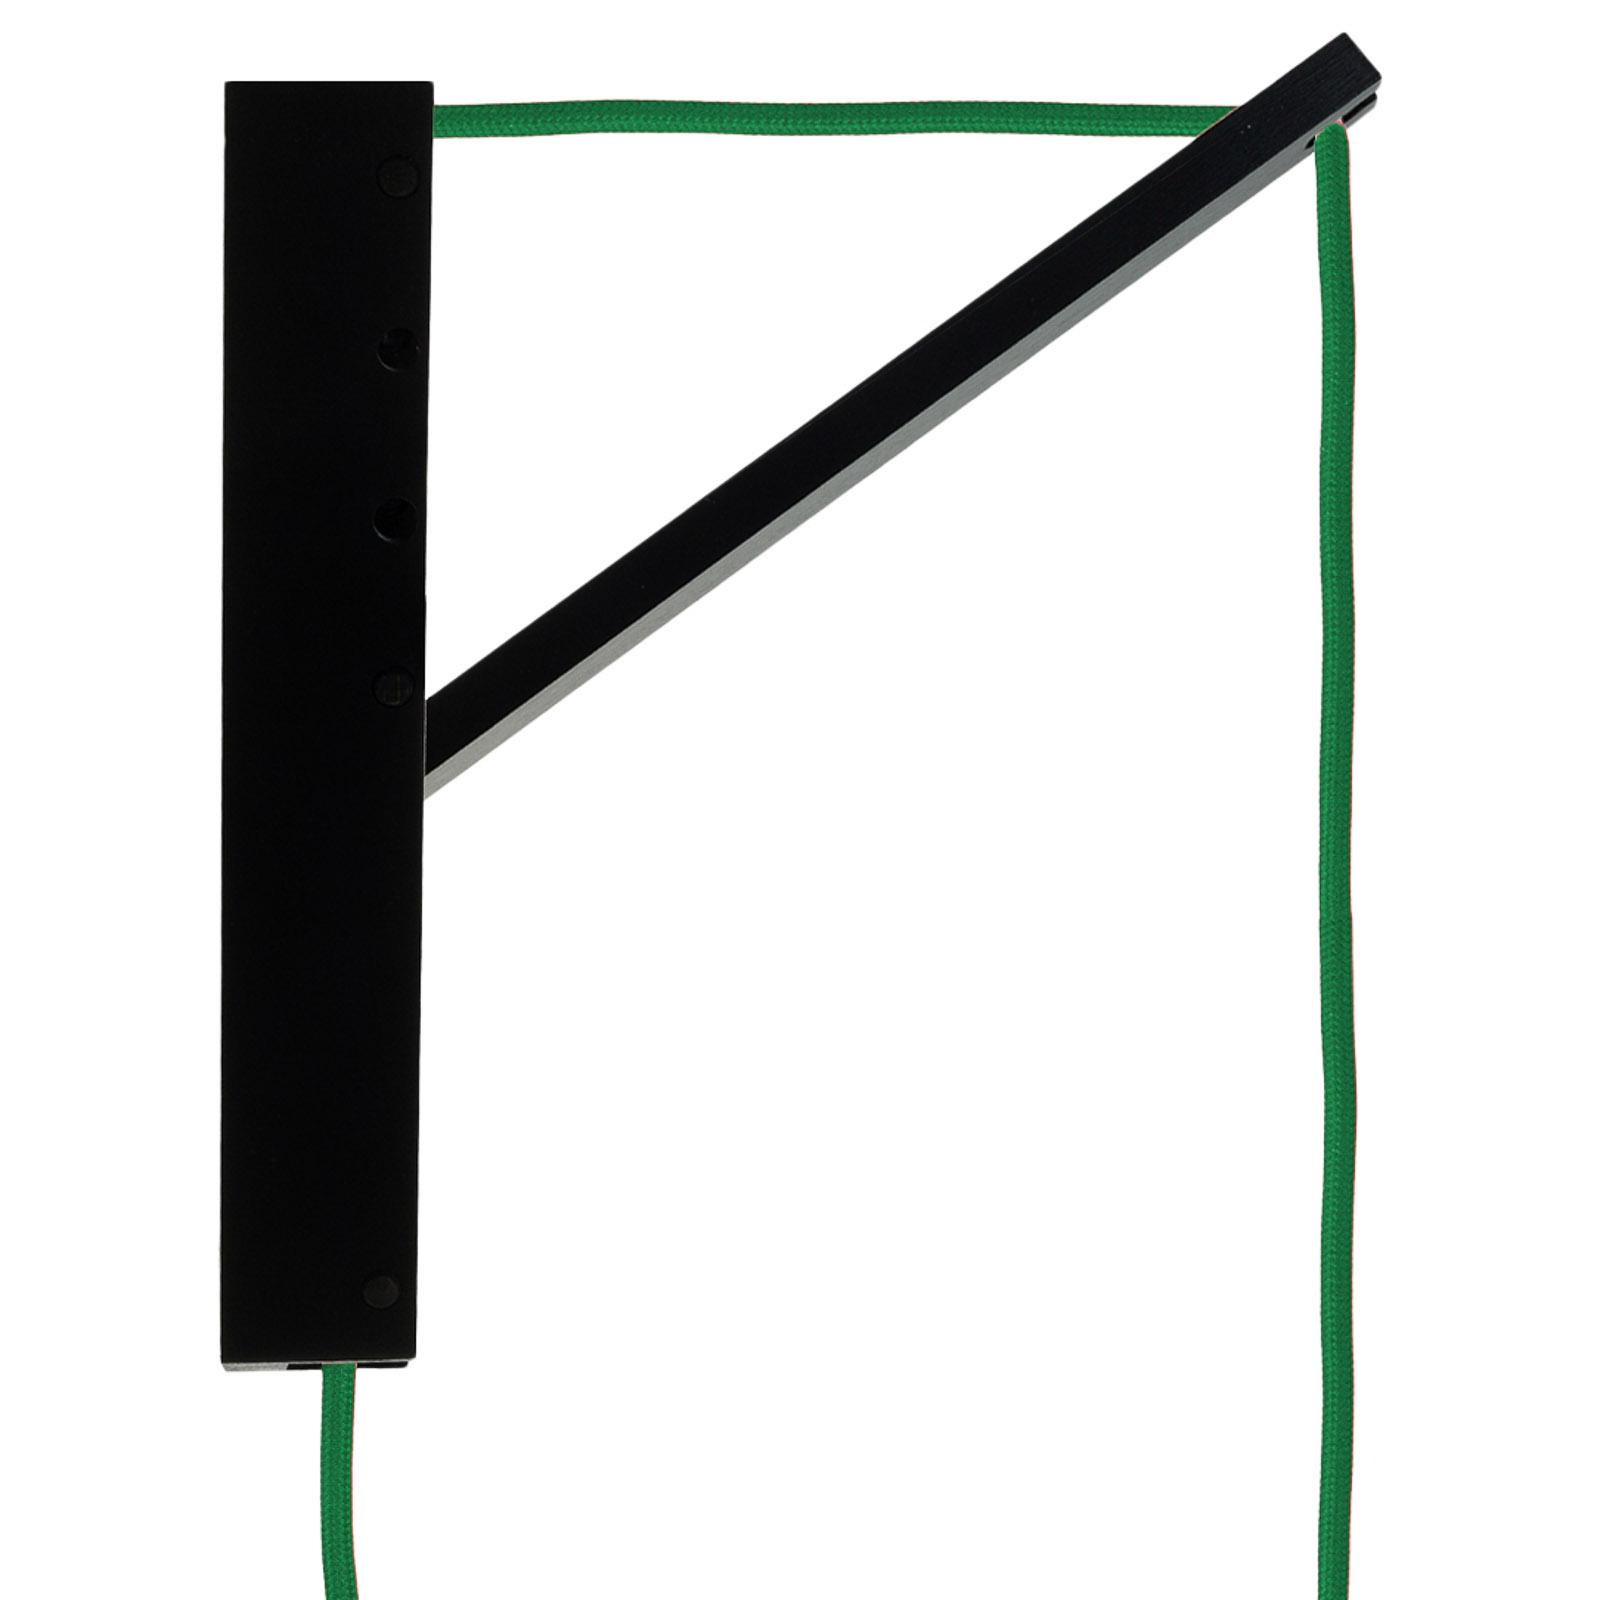 SEGULA Pinokio lampa wisząca czarna, kabel zielony